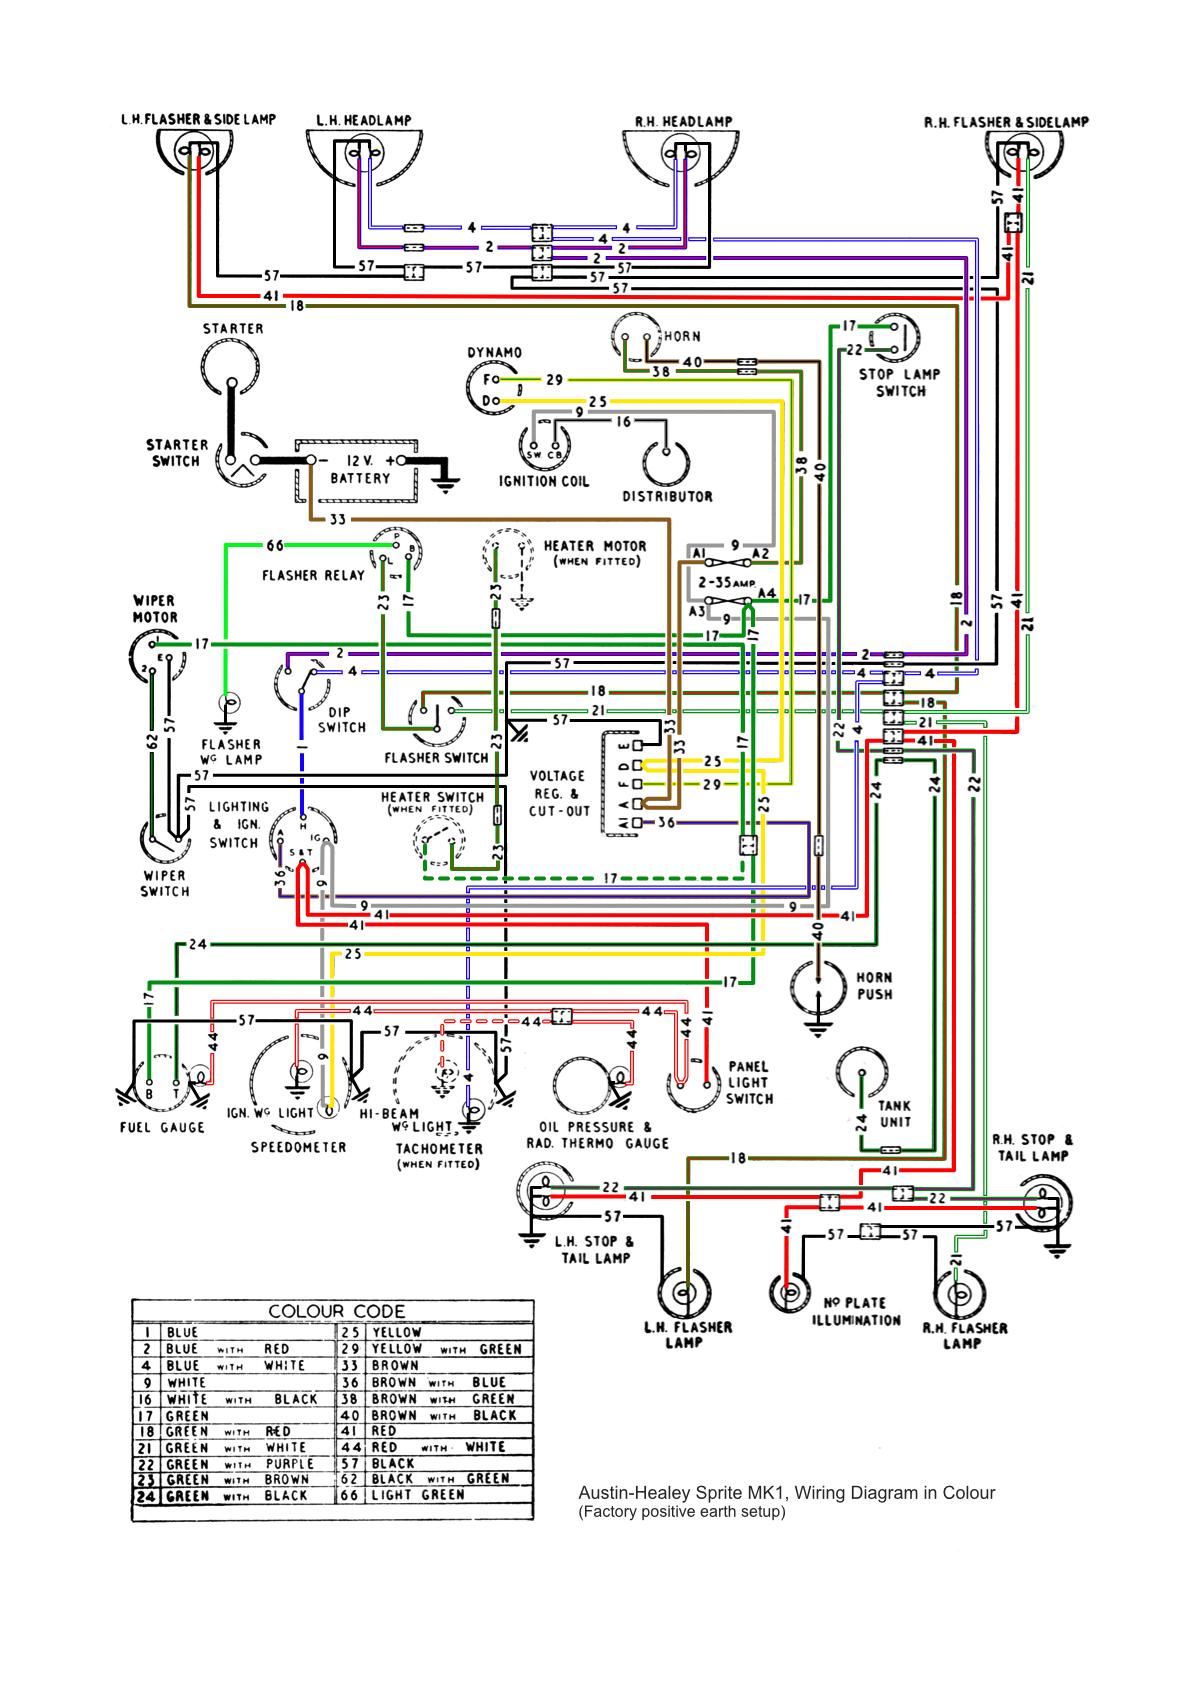 14731302990_7dab766701_o?resize\=665%2C941\&ssl\=1 vine banner wiring diagrams wiring diagrams vine thermostat wiring diagram at nearapp.co